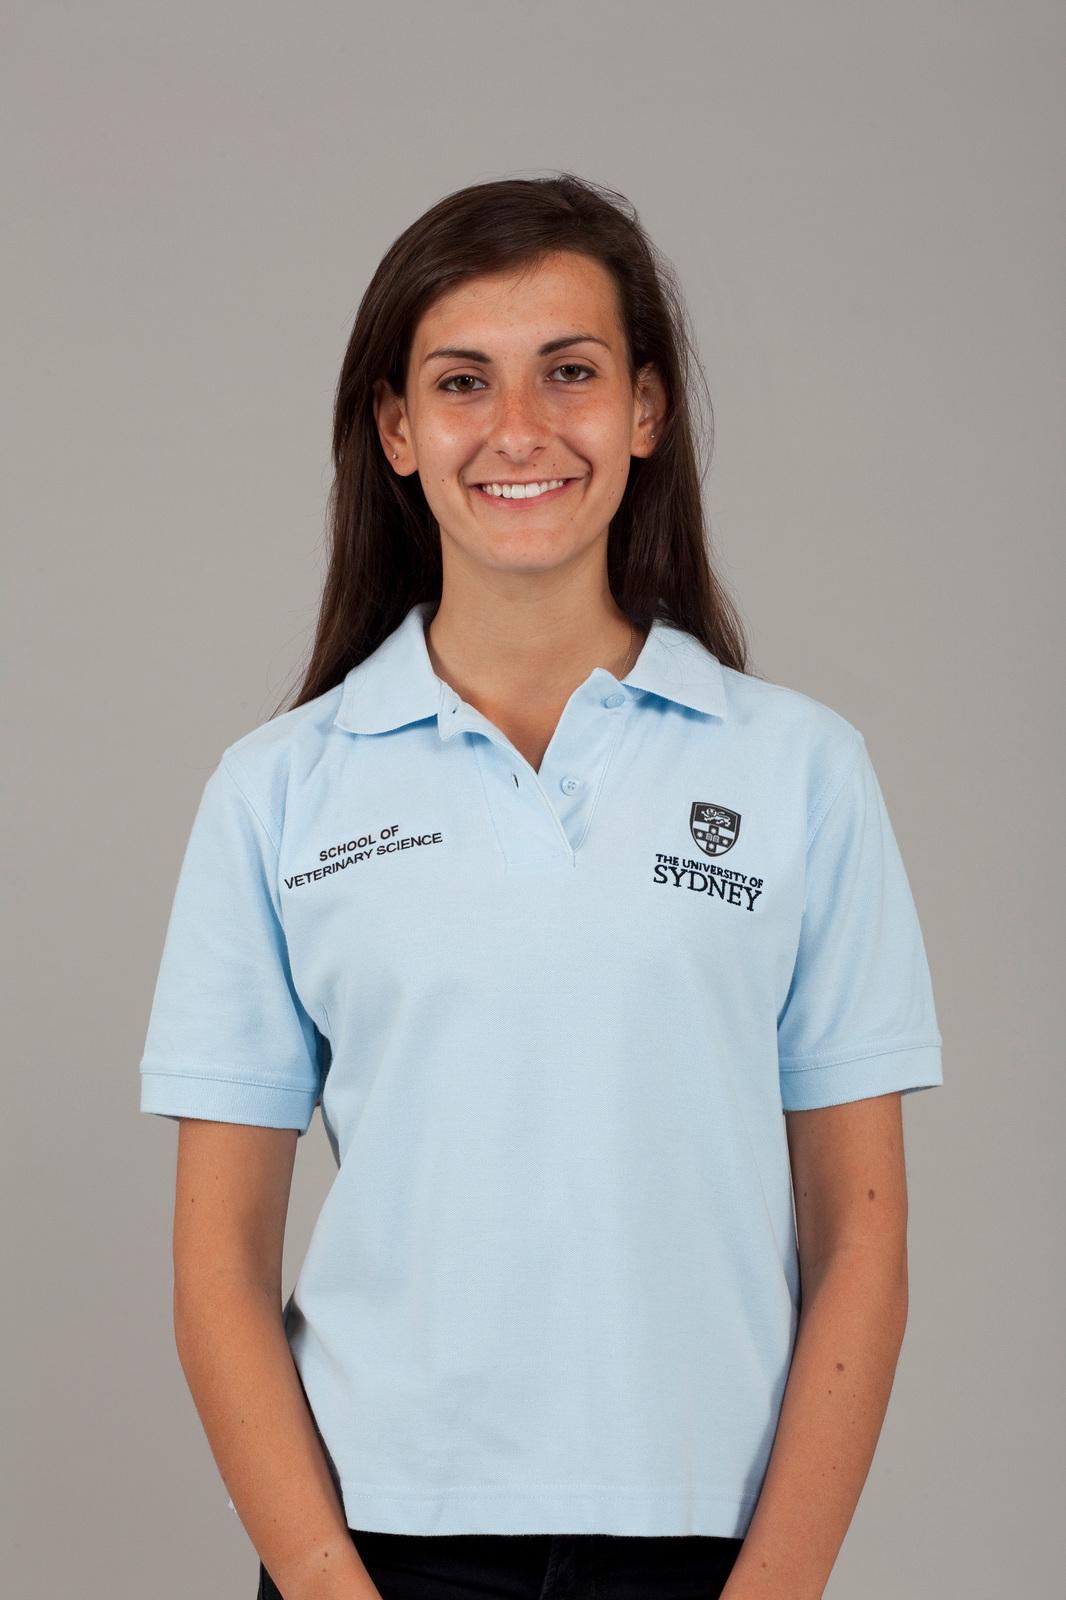 The University Of Sydney Estore Polo Shirt Womens School Of